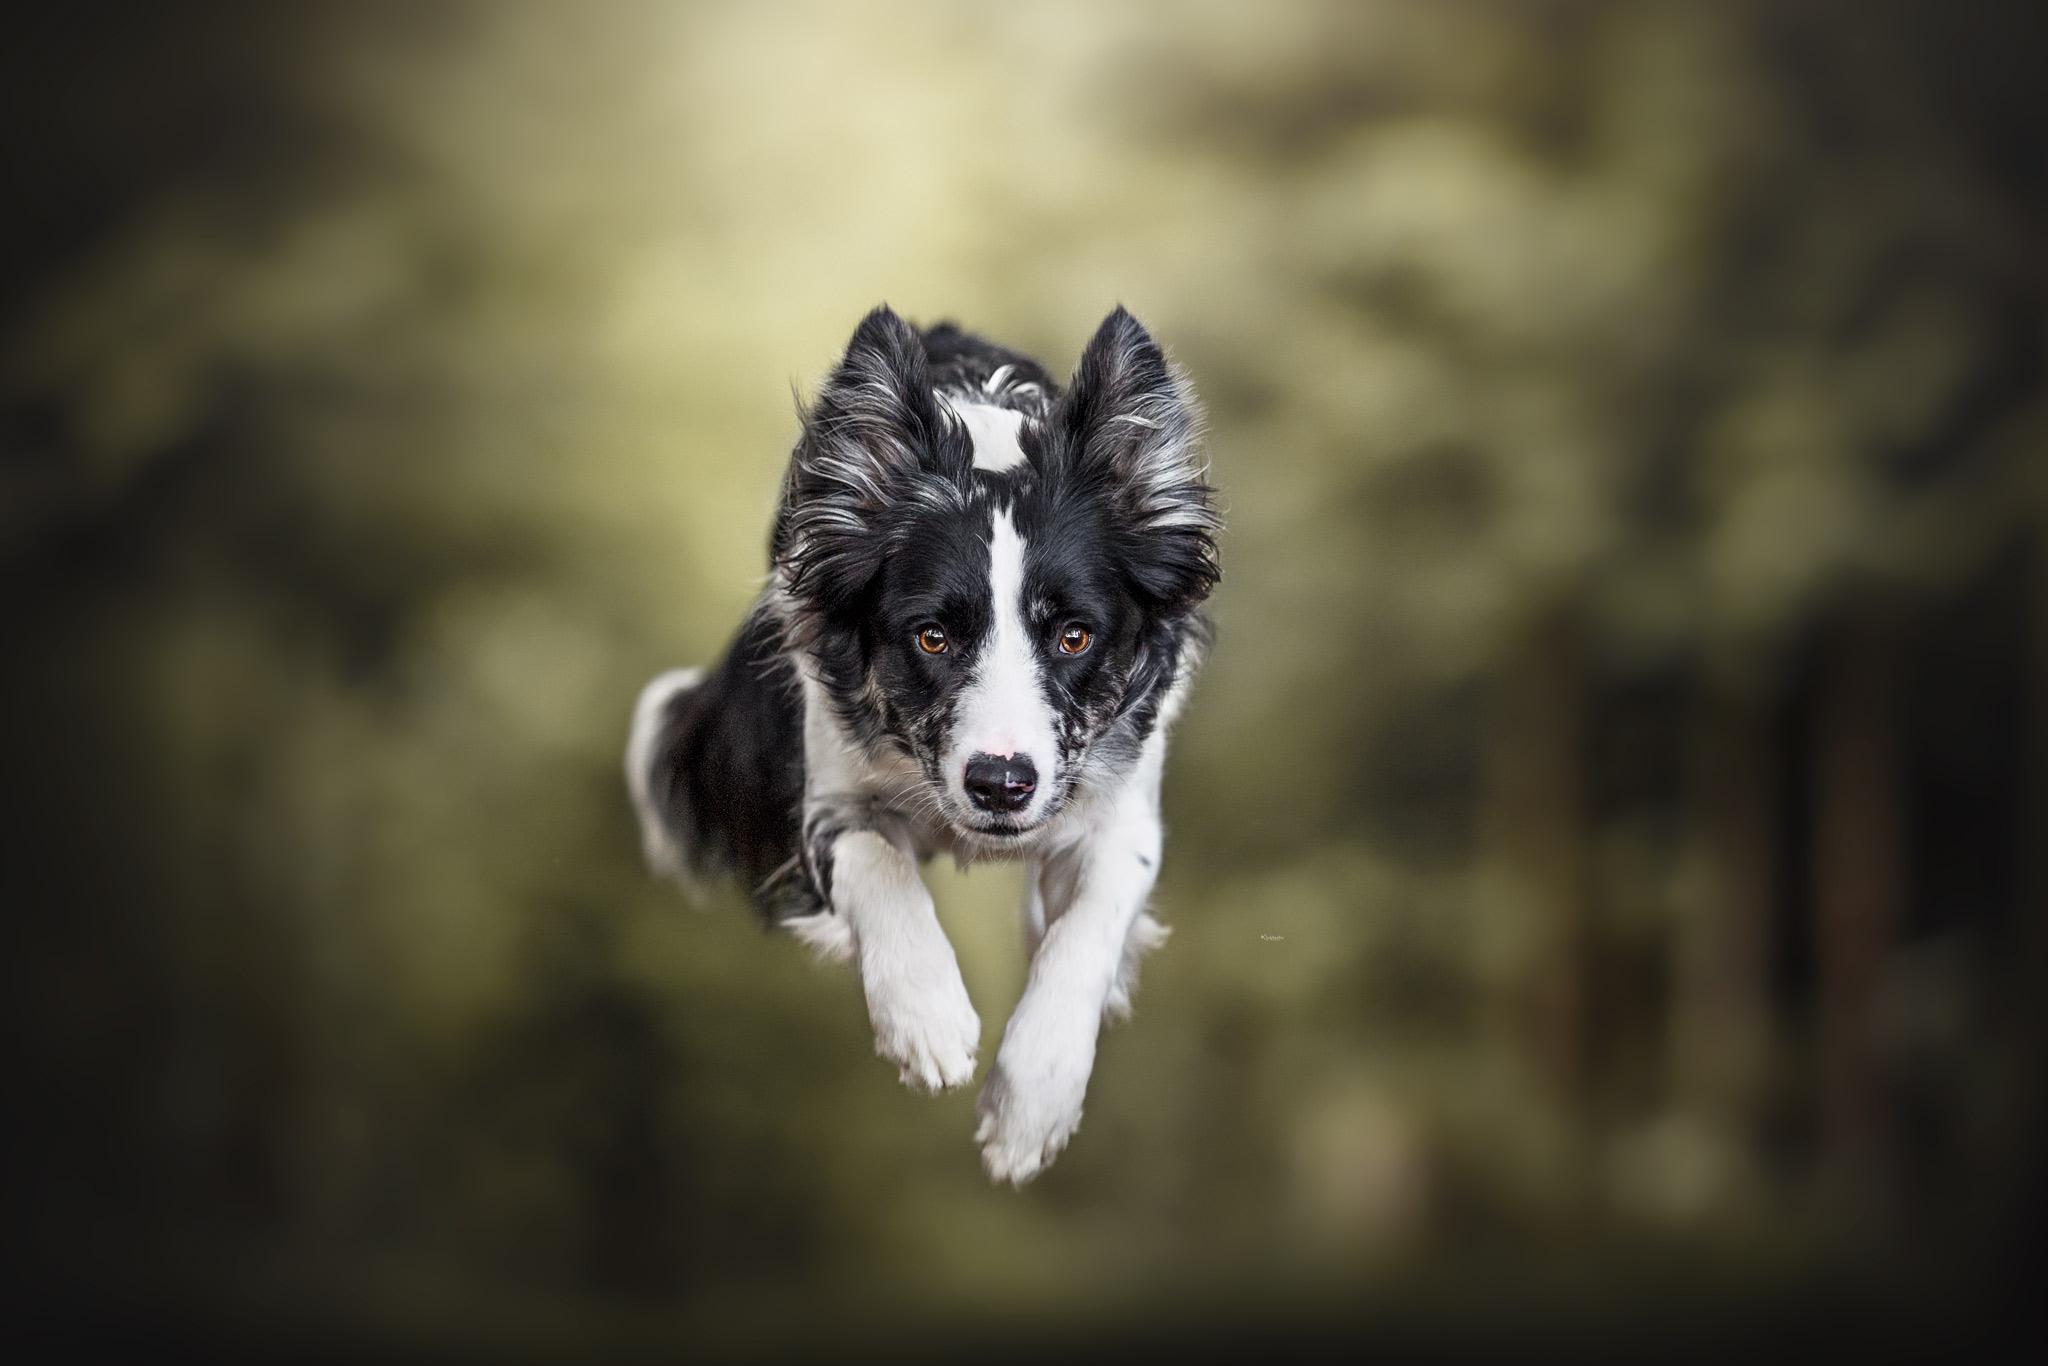 Black Merle Border Collie springend im Wald